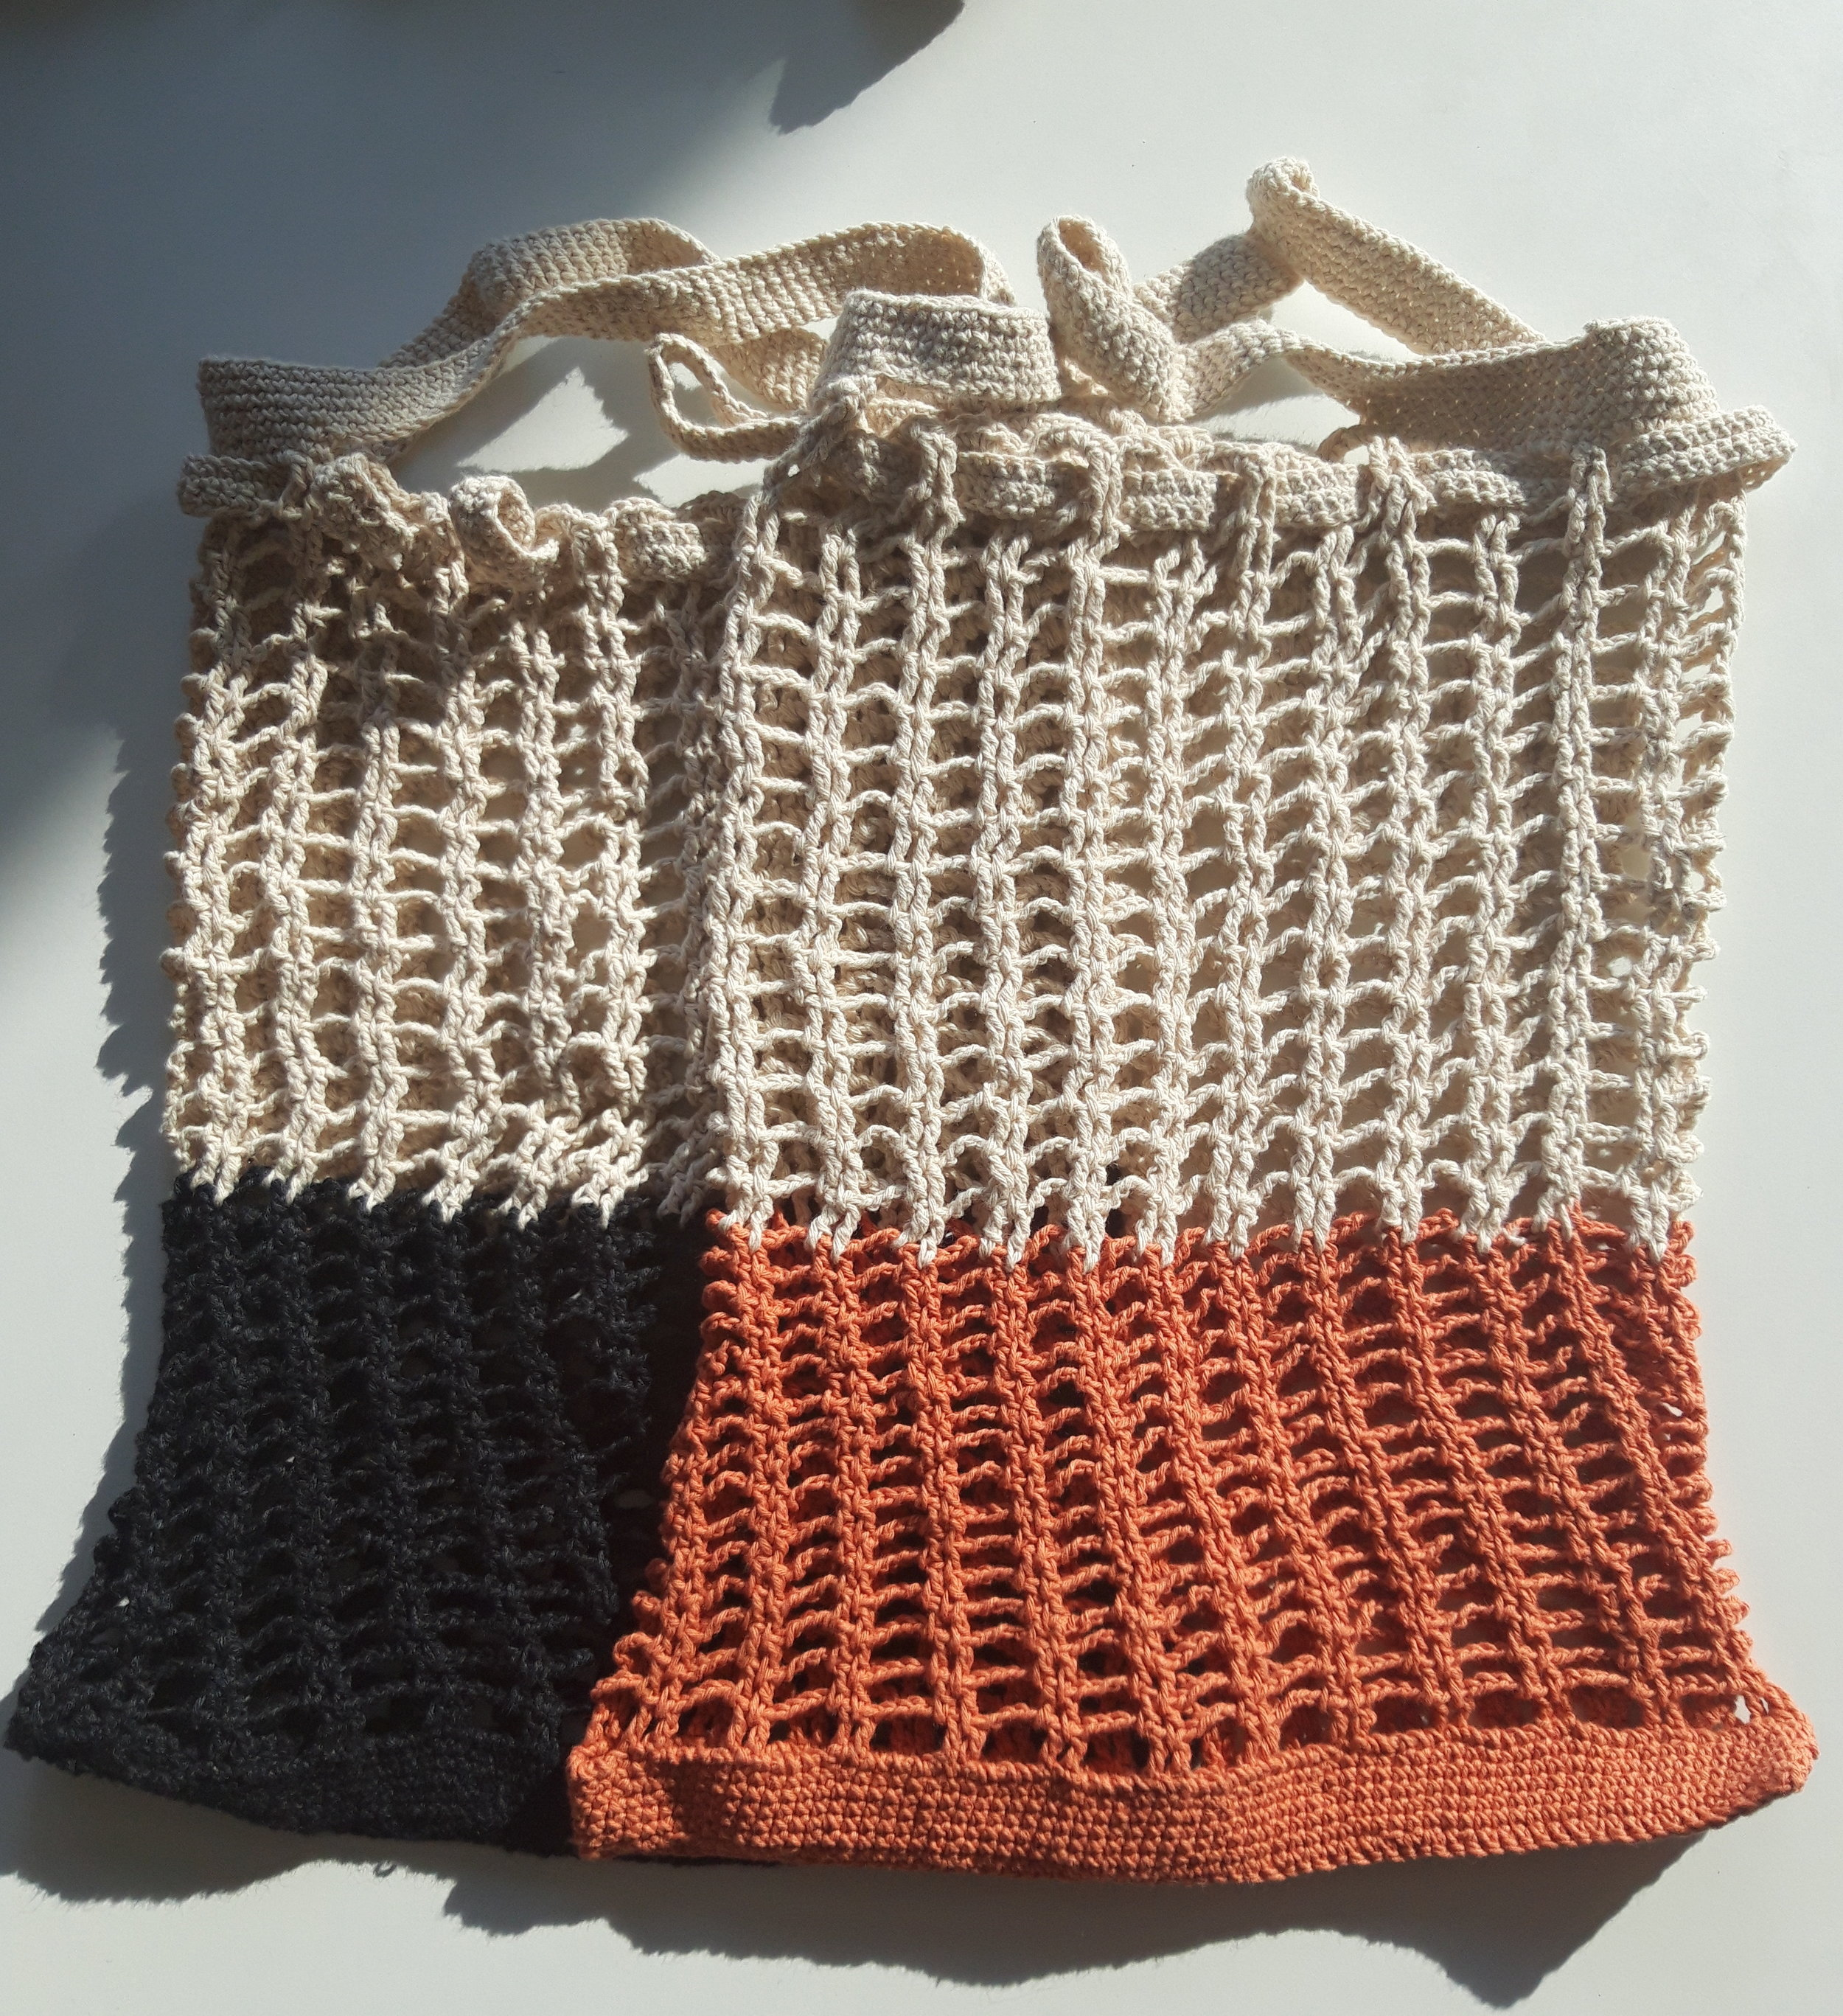 Beautiful bags made by Ibu Encum.